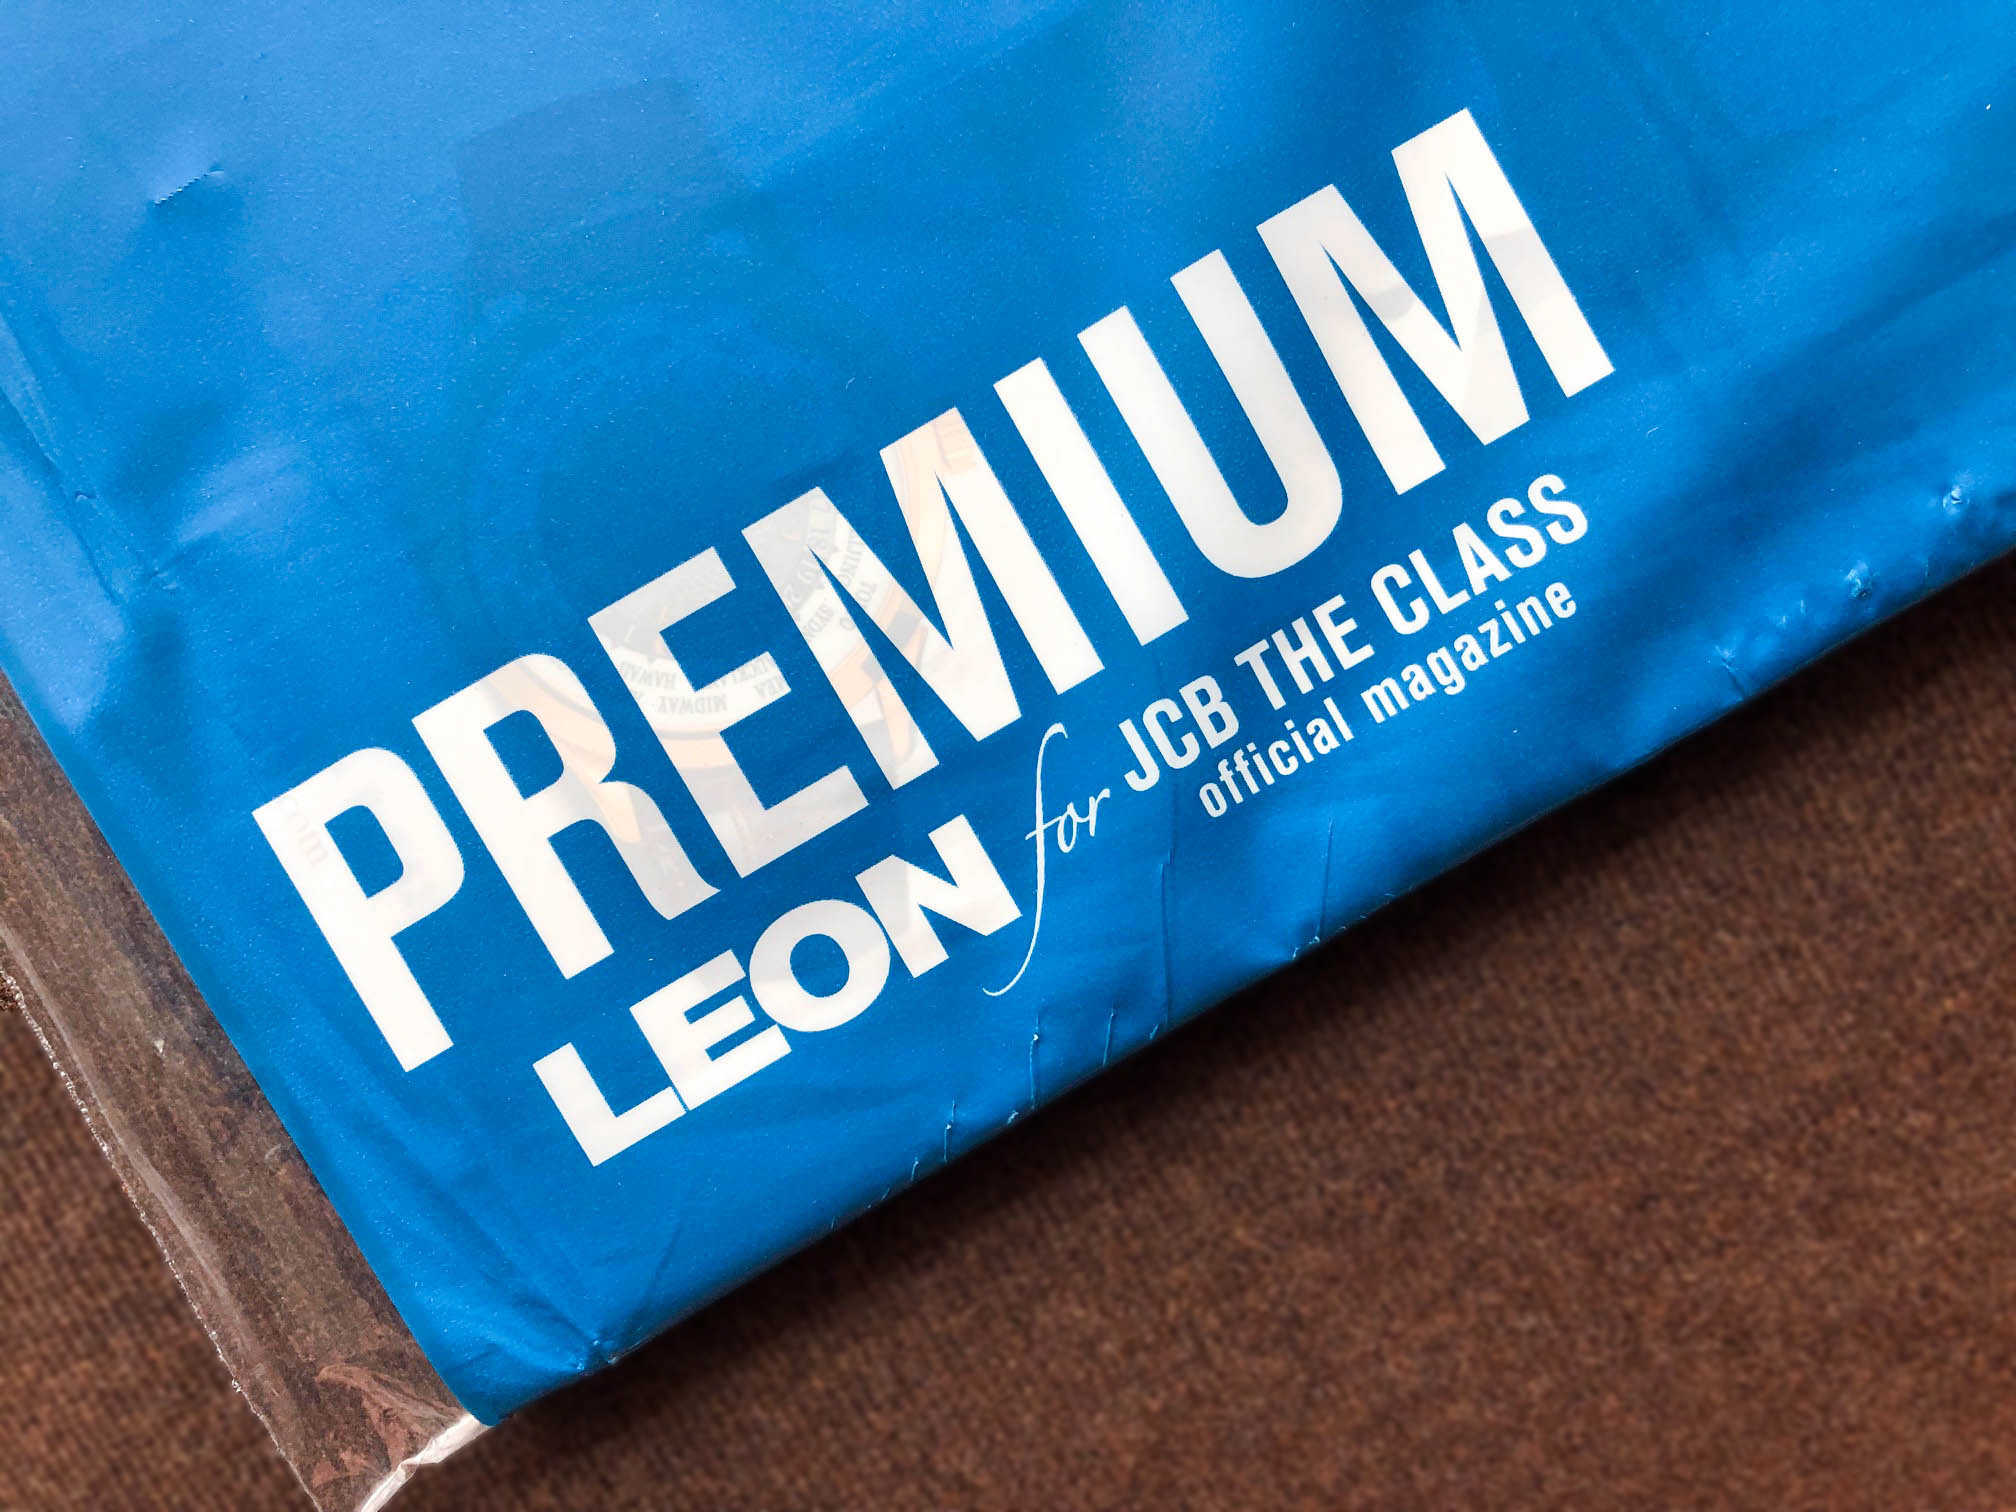 premium leon jcb the class 2019107 1